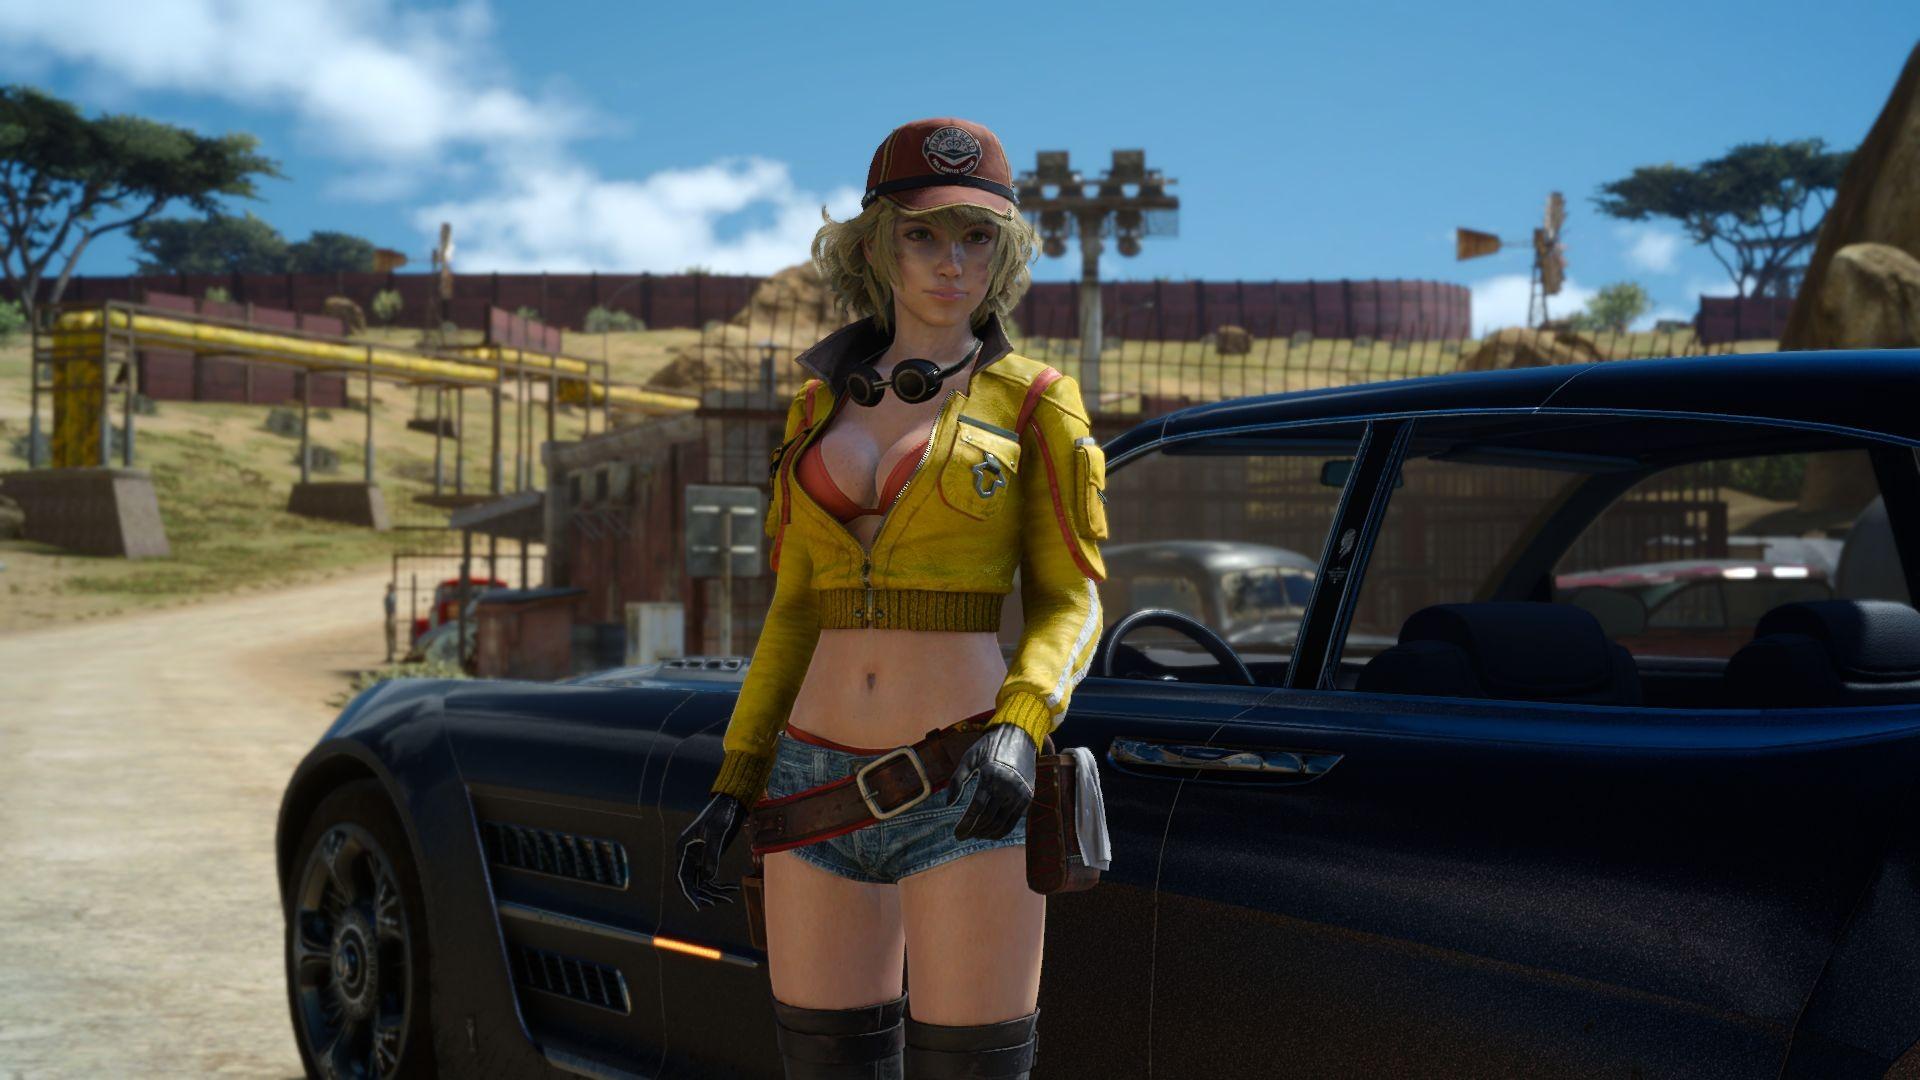 Фанат сравнил версии Final Fantasy XV для PC и PS4 на скриншотах